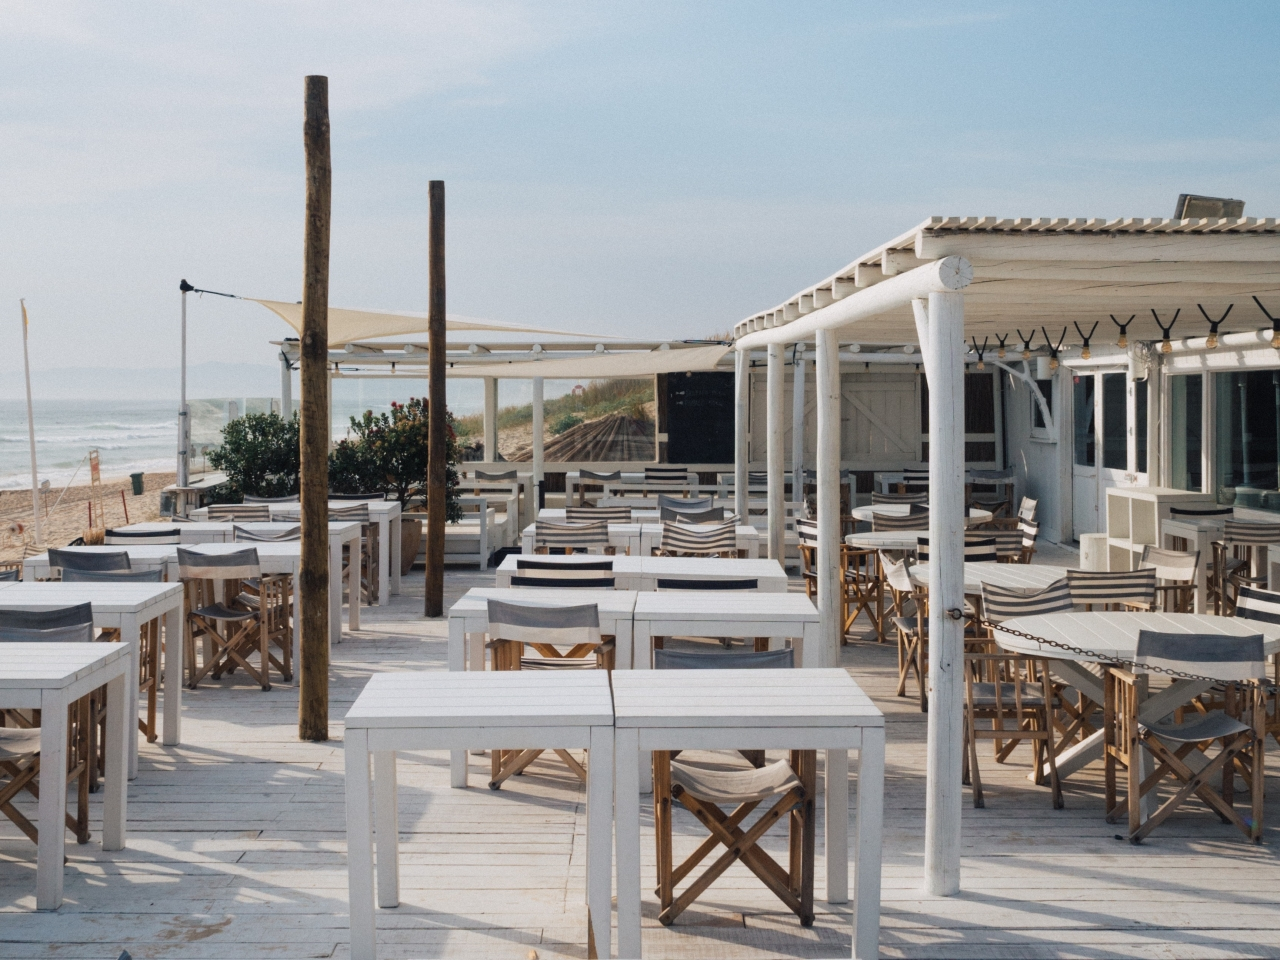 Strandbars für das perfekte Summer Feeling | Unplanned